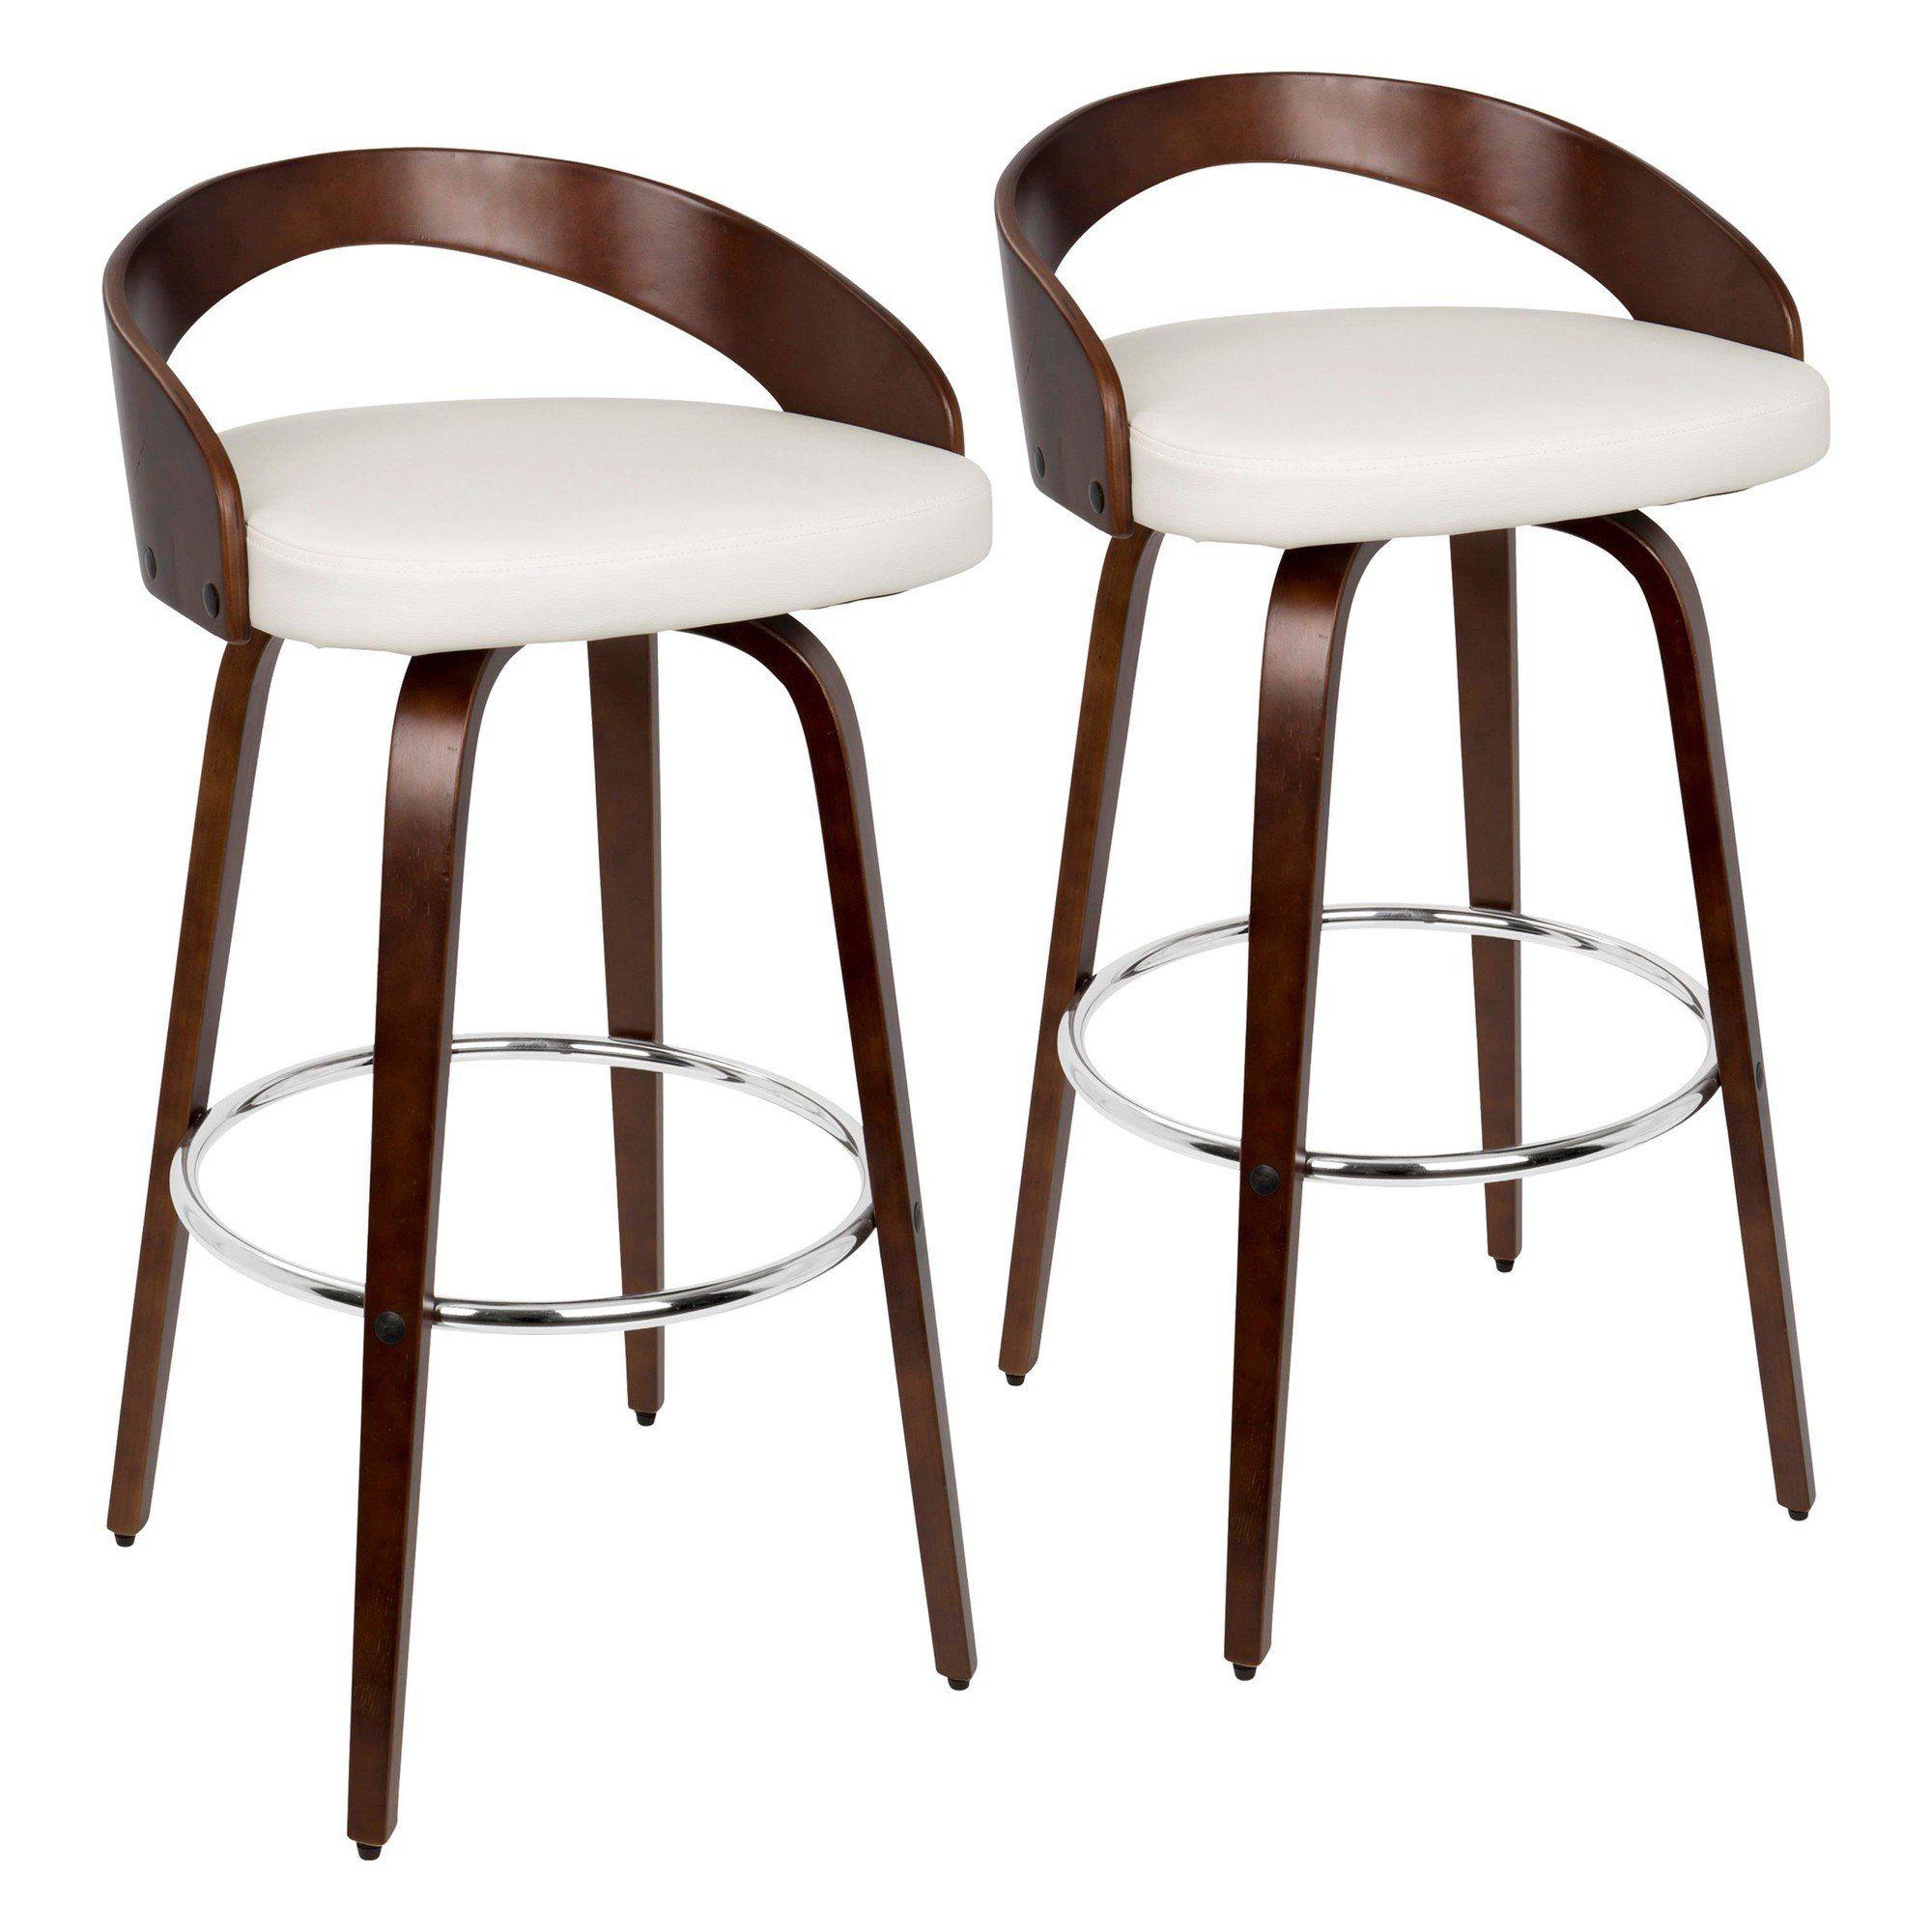 Lumisource Grotto Barstool Set Of 2 Cherry Wood White Pu Chrome In 2021 Modern Counter Stools Swivel Counter Stools Modern Bar Stools Contemporary swivel bar stools